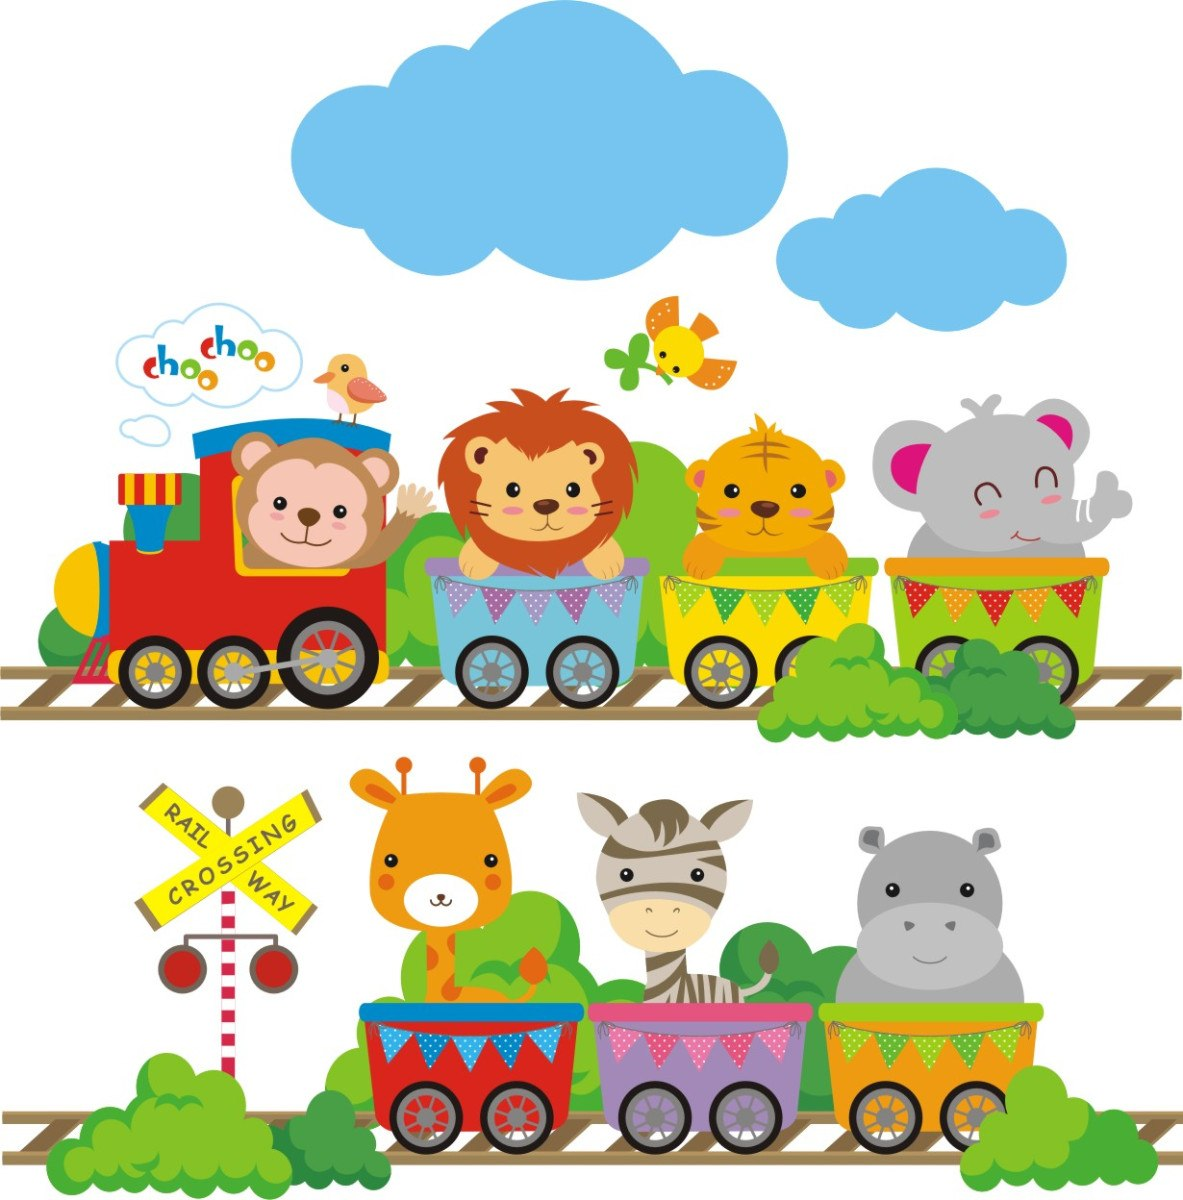 https://mlb-s1-p.mlstatic.com/adesivo-decorativo-parede-safari-infantil-bebe-zoo-trenzinho-11188-MLB20039259546_012014-F.jpg